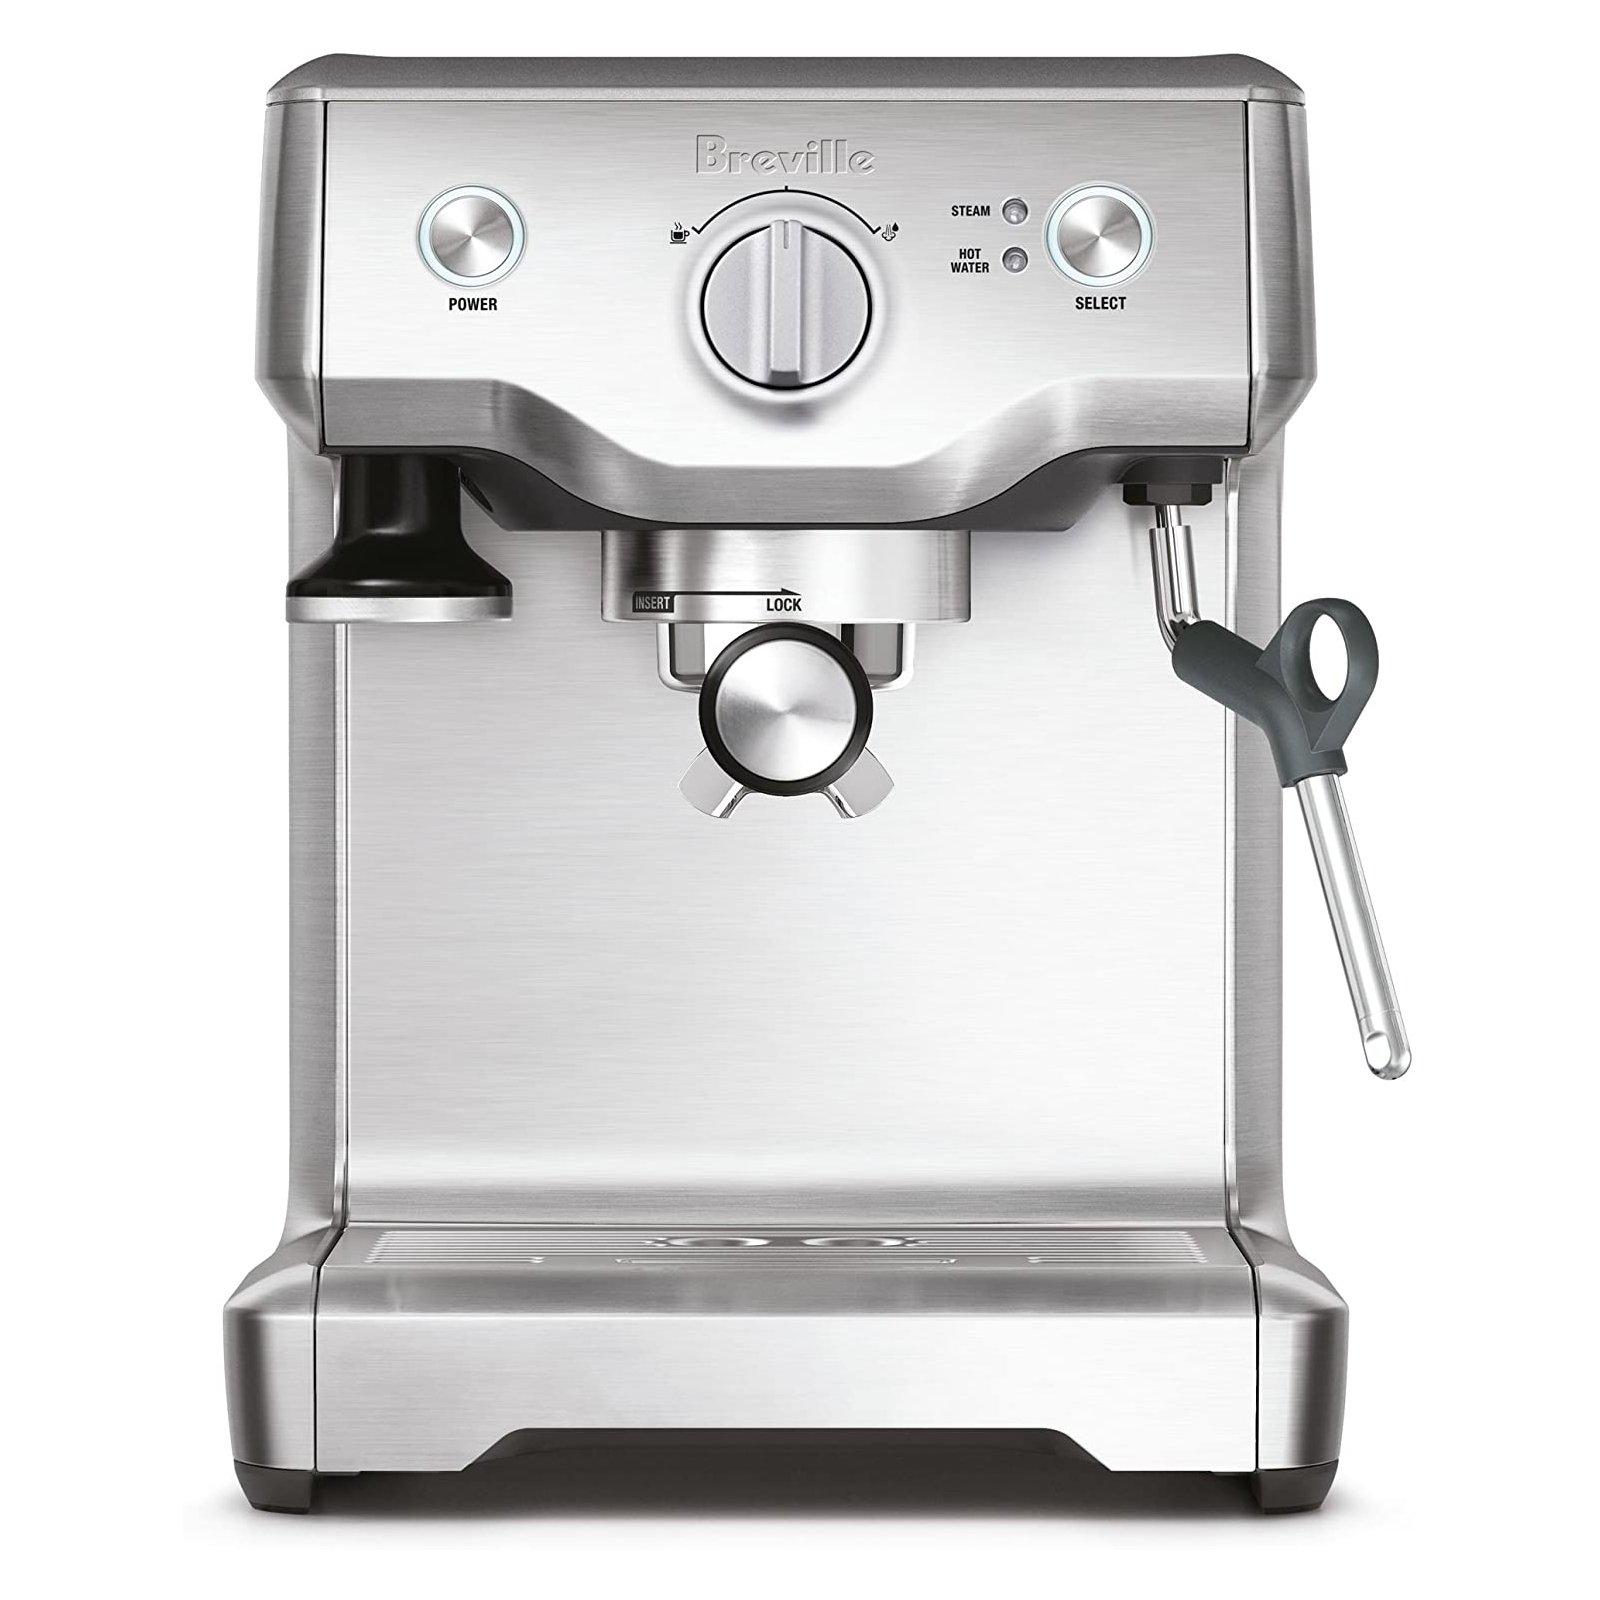 【鉑富 Breville Duo Temp Pro Espresso 義式咖啡機】15 bar